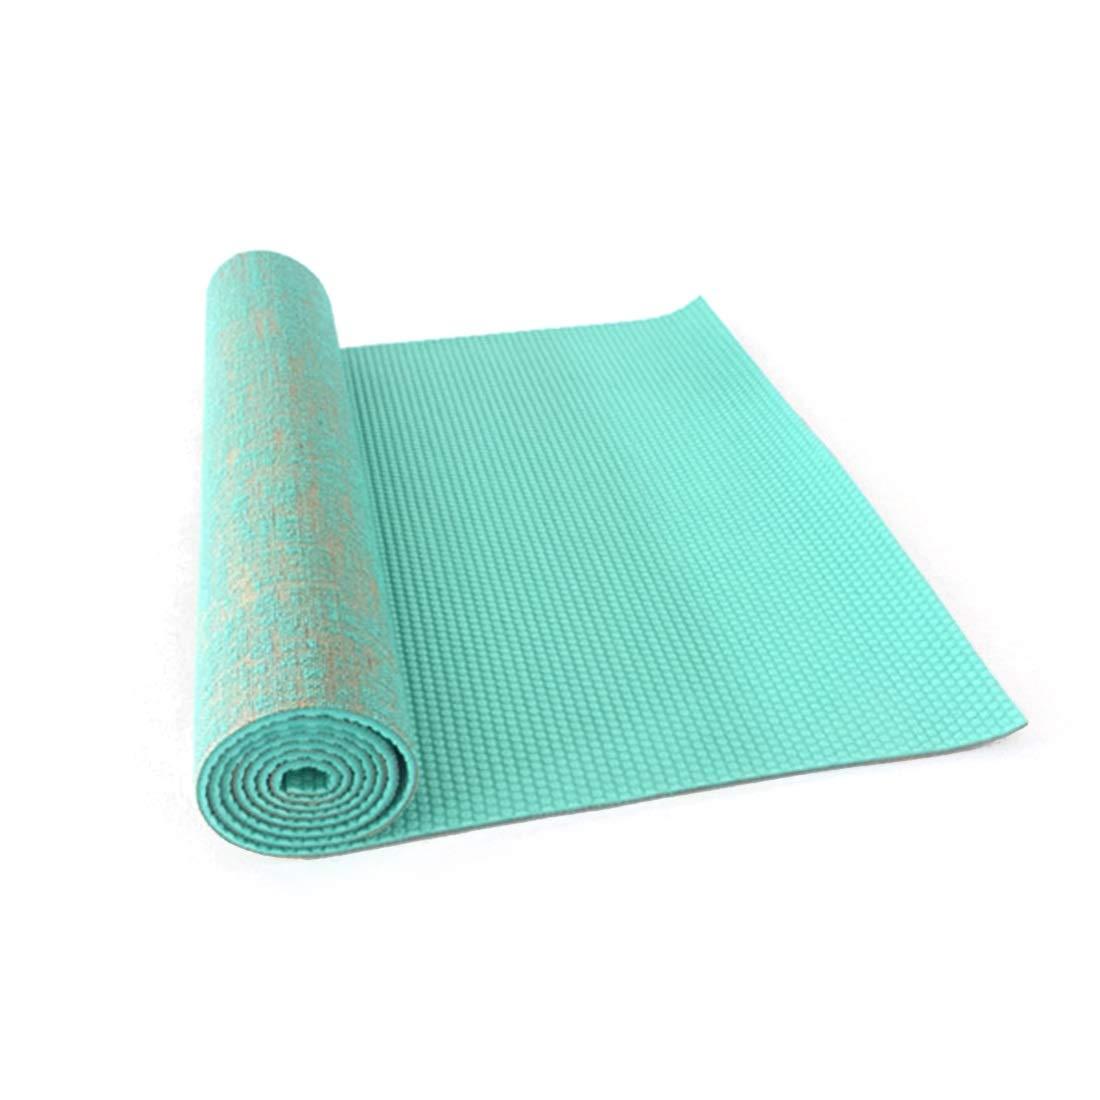 LINANNAV PVC Yoga Mat Ambientalmente amigable Antideslizante ...